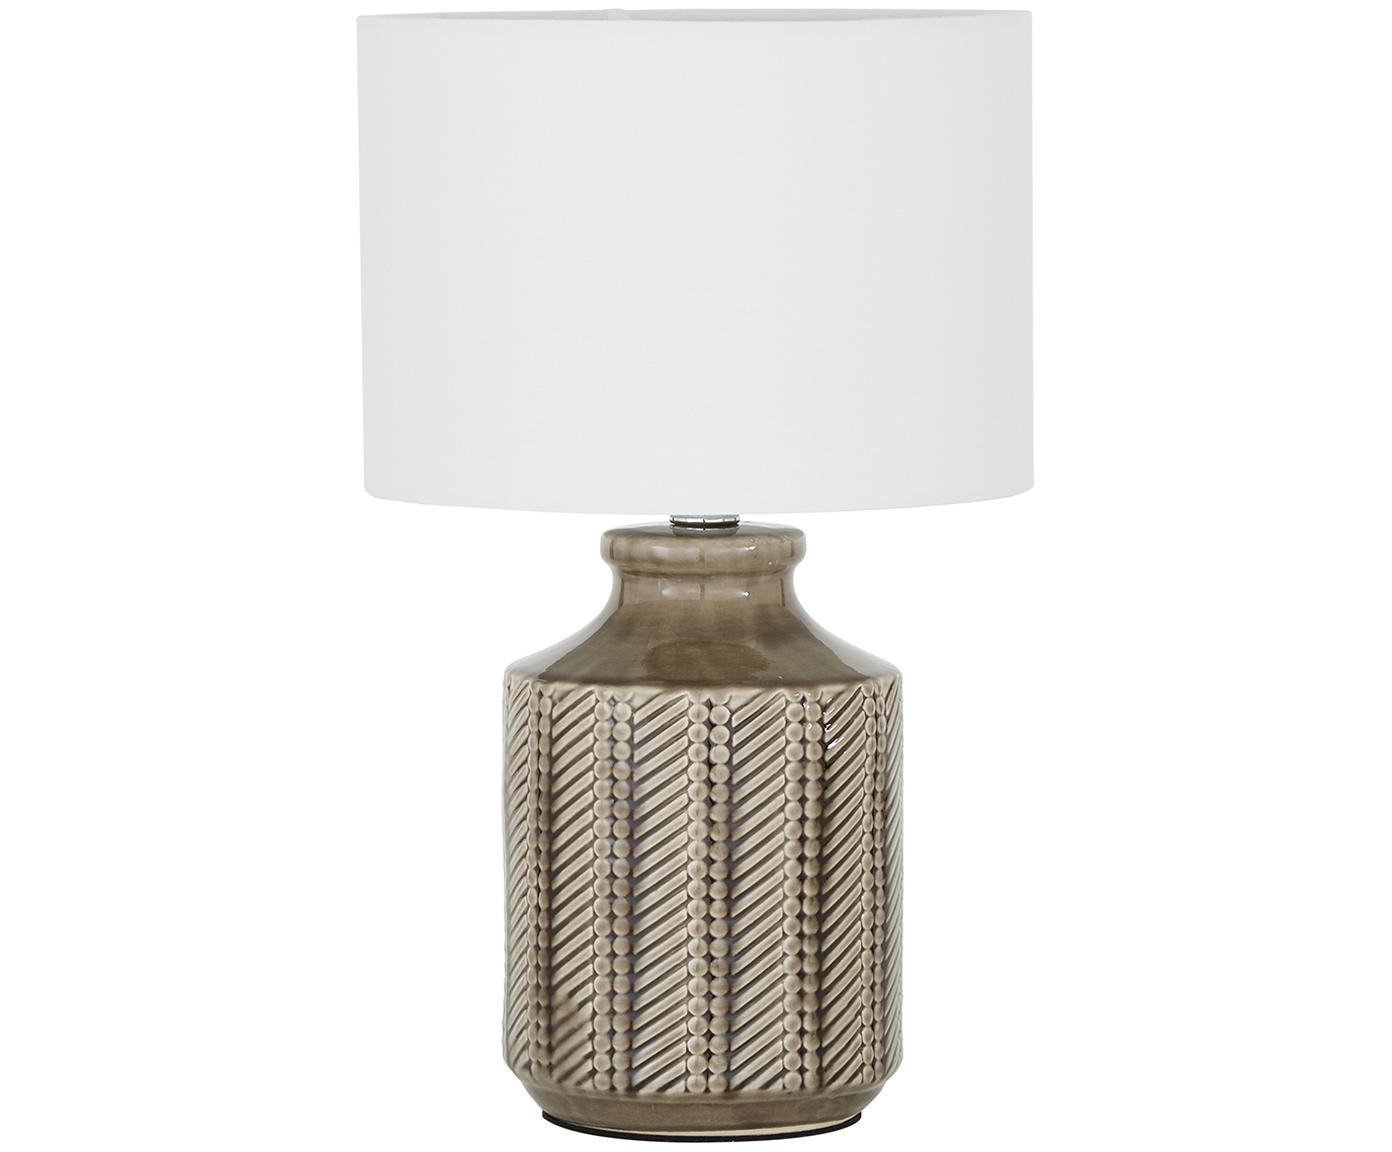 Keramische tafellamp Nia, Lampenkap: textiel, Lampvoet: keramiek, vernikkeld meta, Lampenkap: wit. Lampvoet: bruin, nikkelkleurig, Ø 26 x H 43 cm